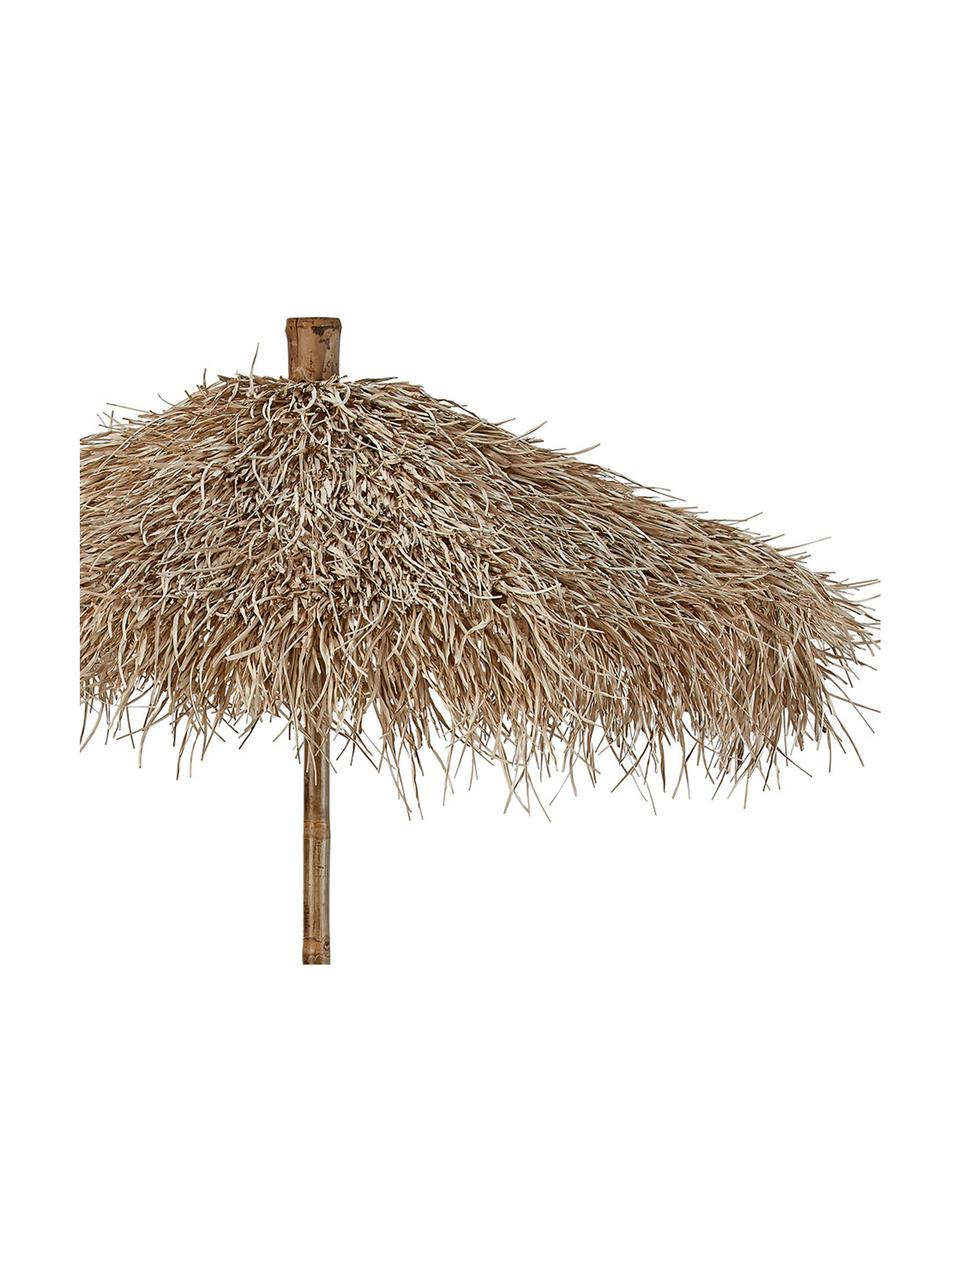 Naturfarbener Bambus-Dekoschirm Mandisa, Ø 150 cm, Bambus, naturbelassen, Bambus, Ø 150 x H 240 cm